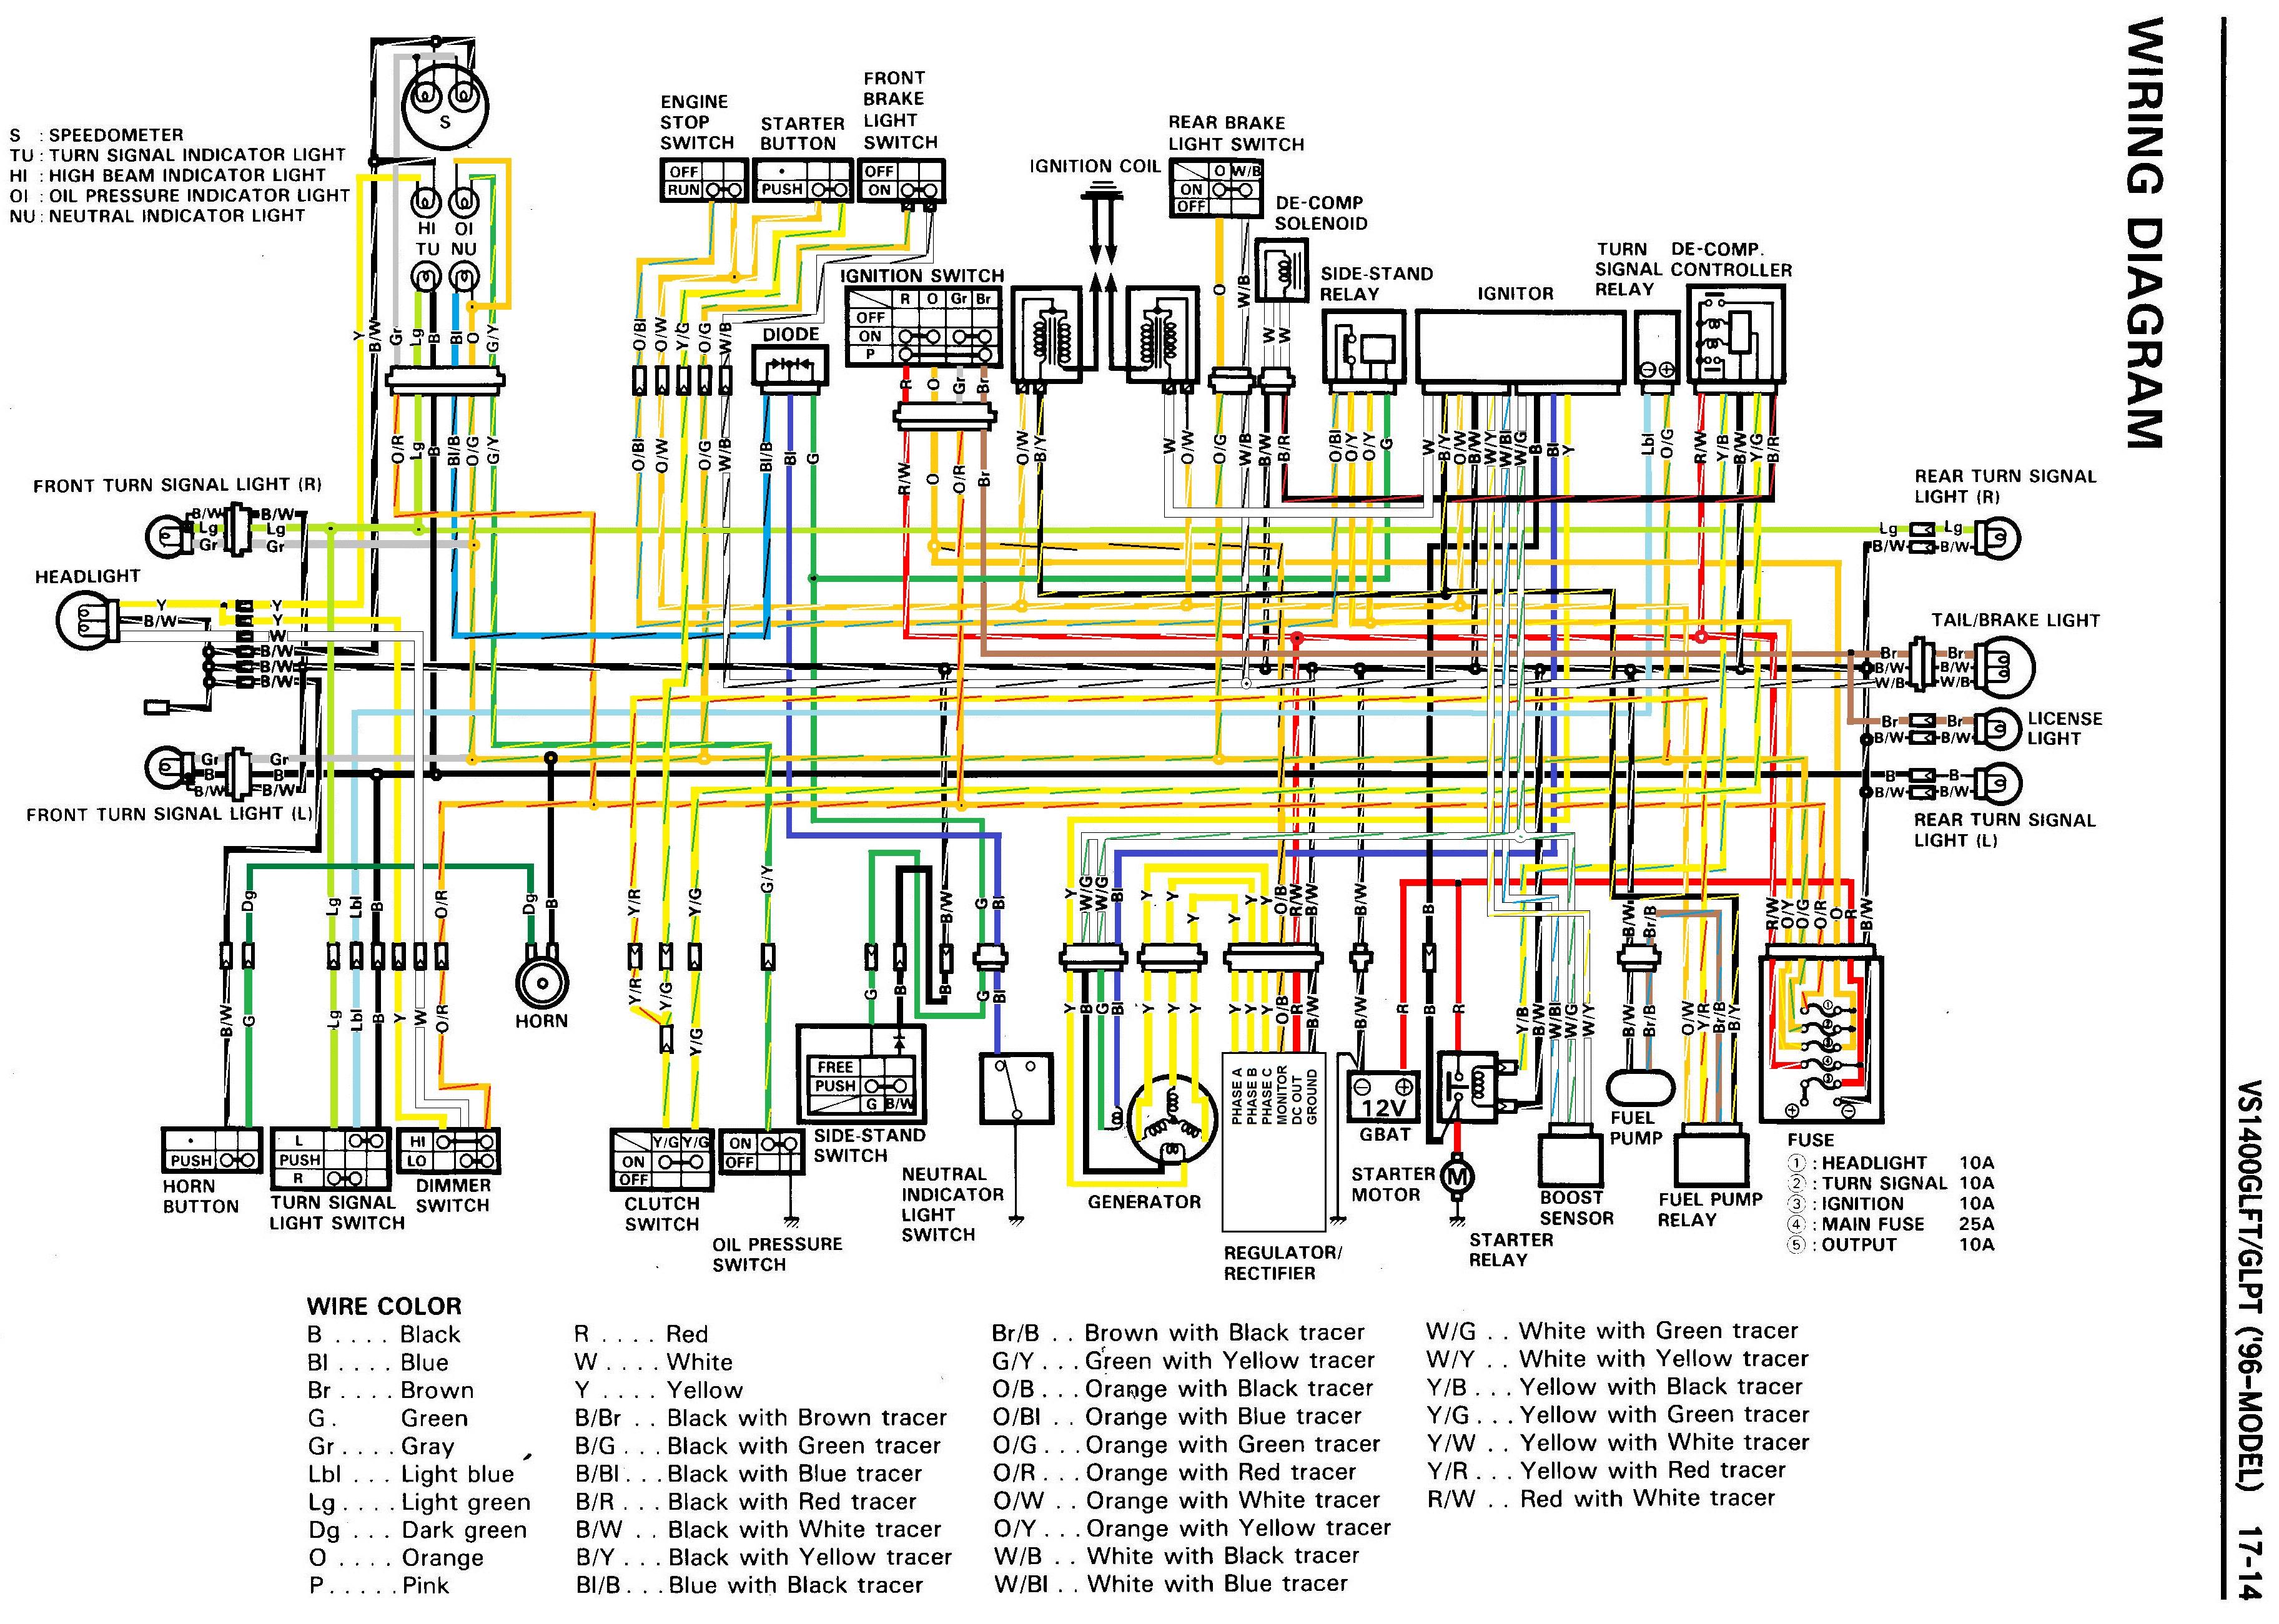 [EQHS_1162]  LN_6784] John Deere 4020 Wiring Diagram John Deere 4440 Tractor Wiring  Diagram Download Diagram | Wiring Schematic For 4440 John Deere |  | Rous Zidur Cular Trons Mohammedshrine Librar Wiring 101